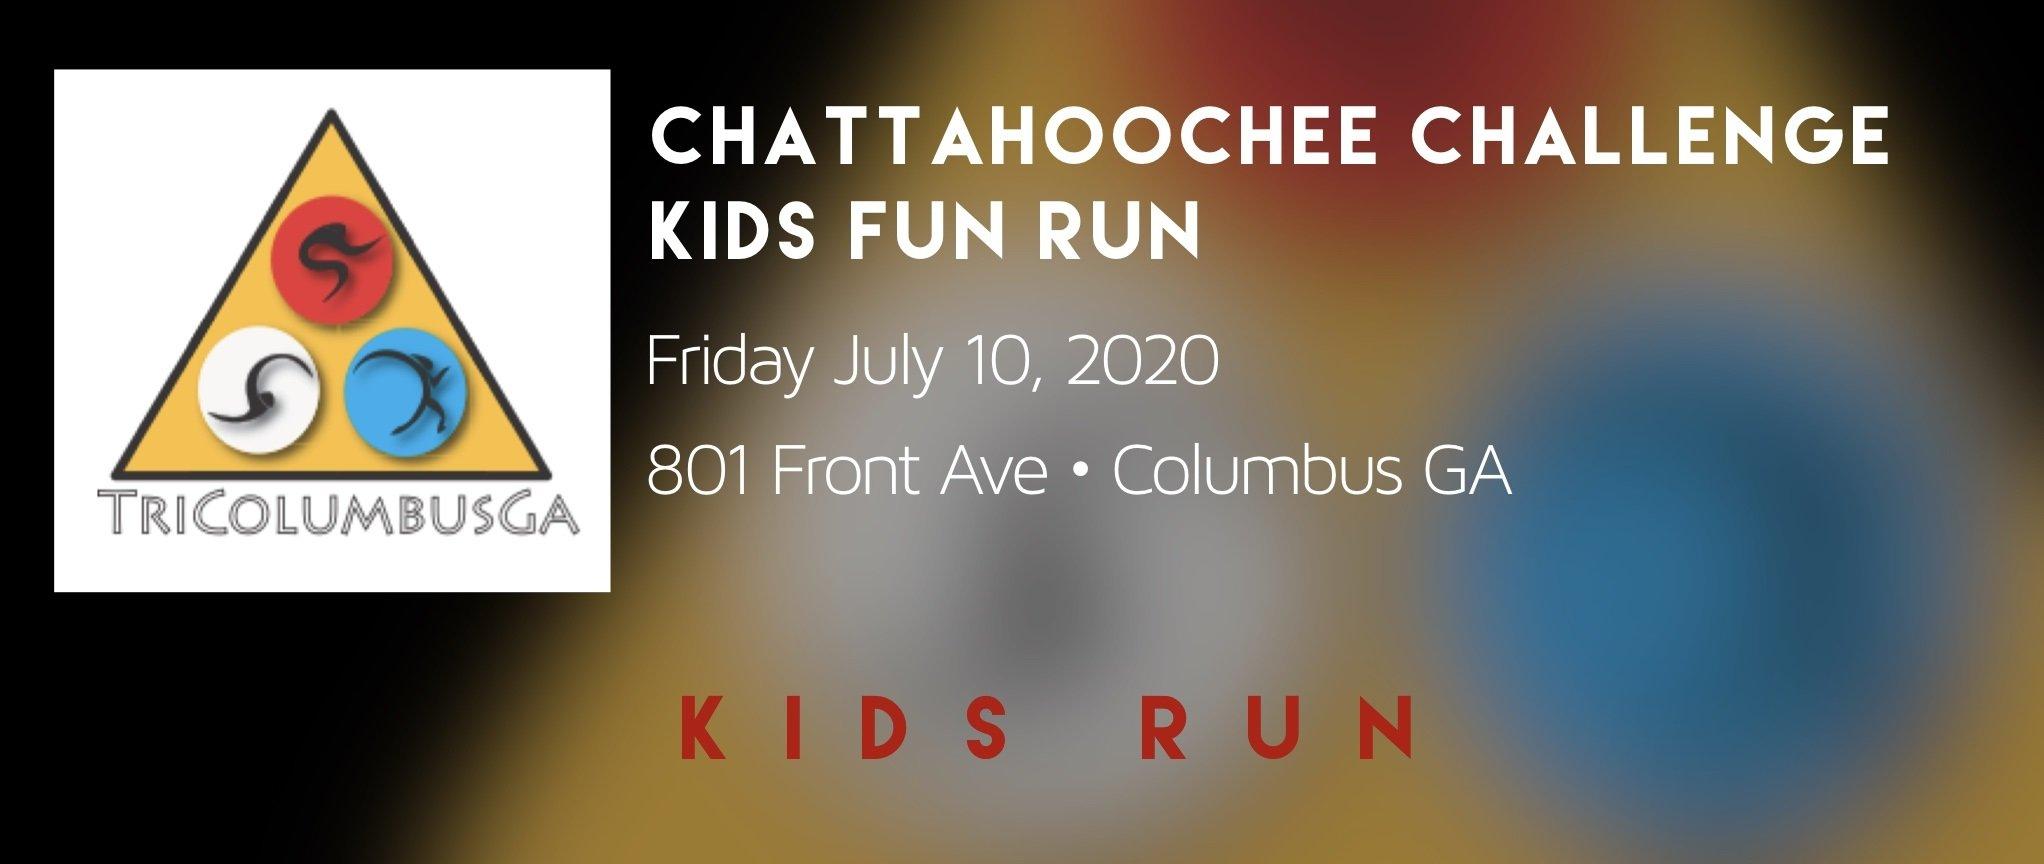 chatt kids 20